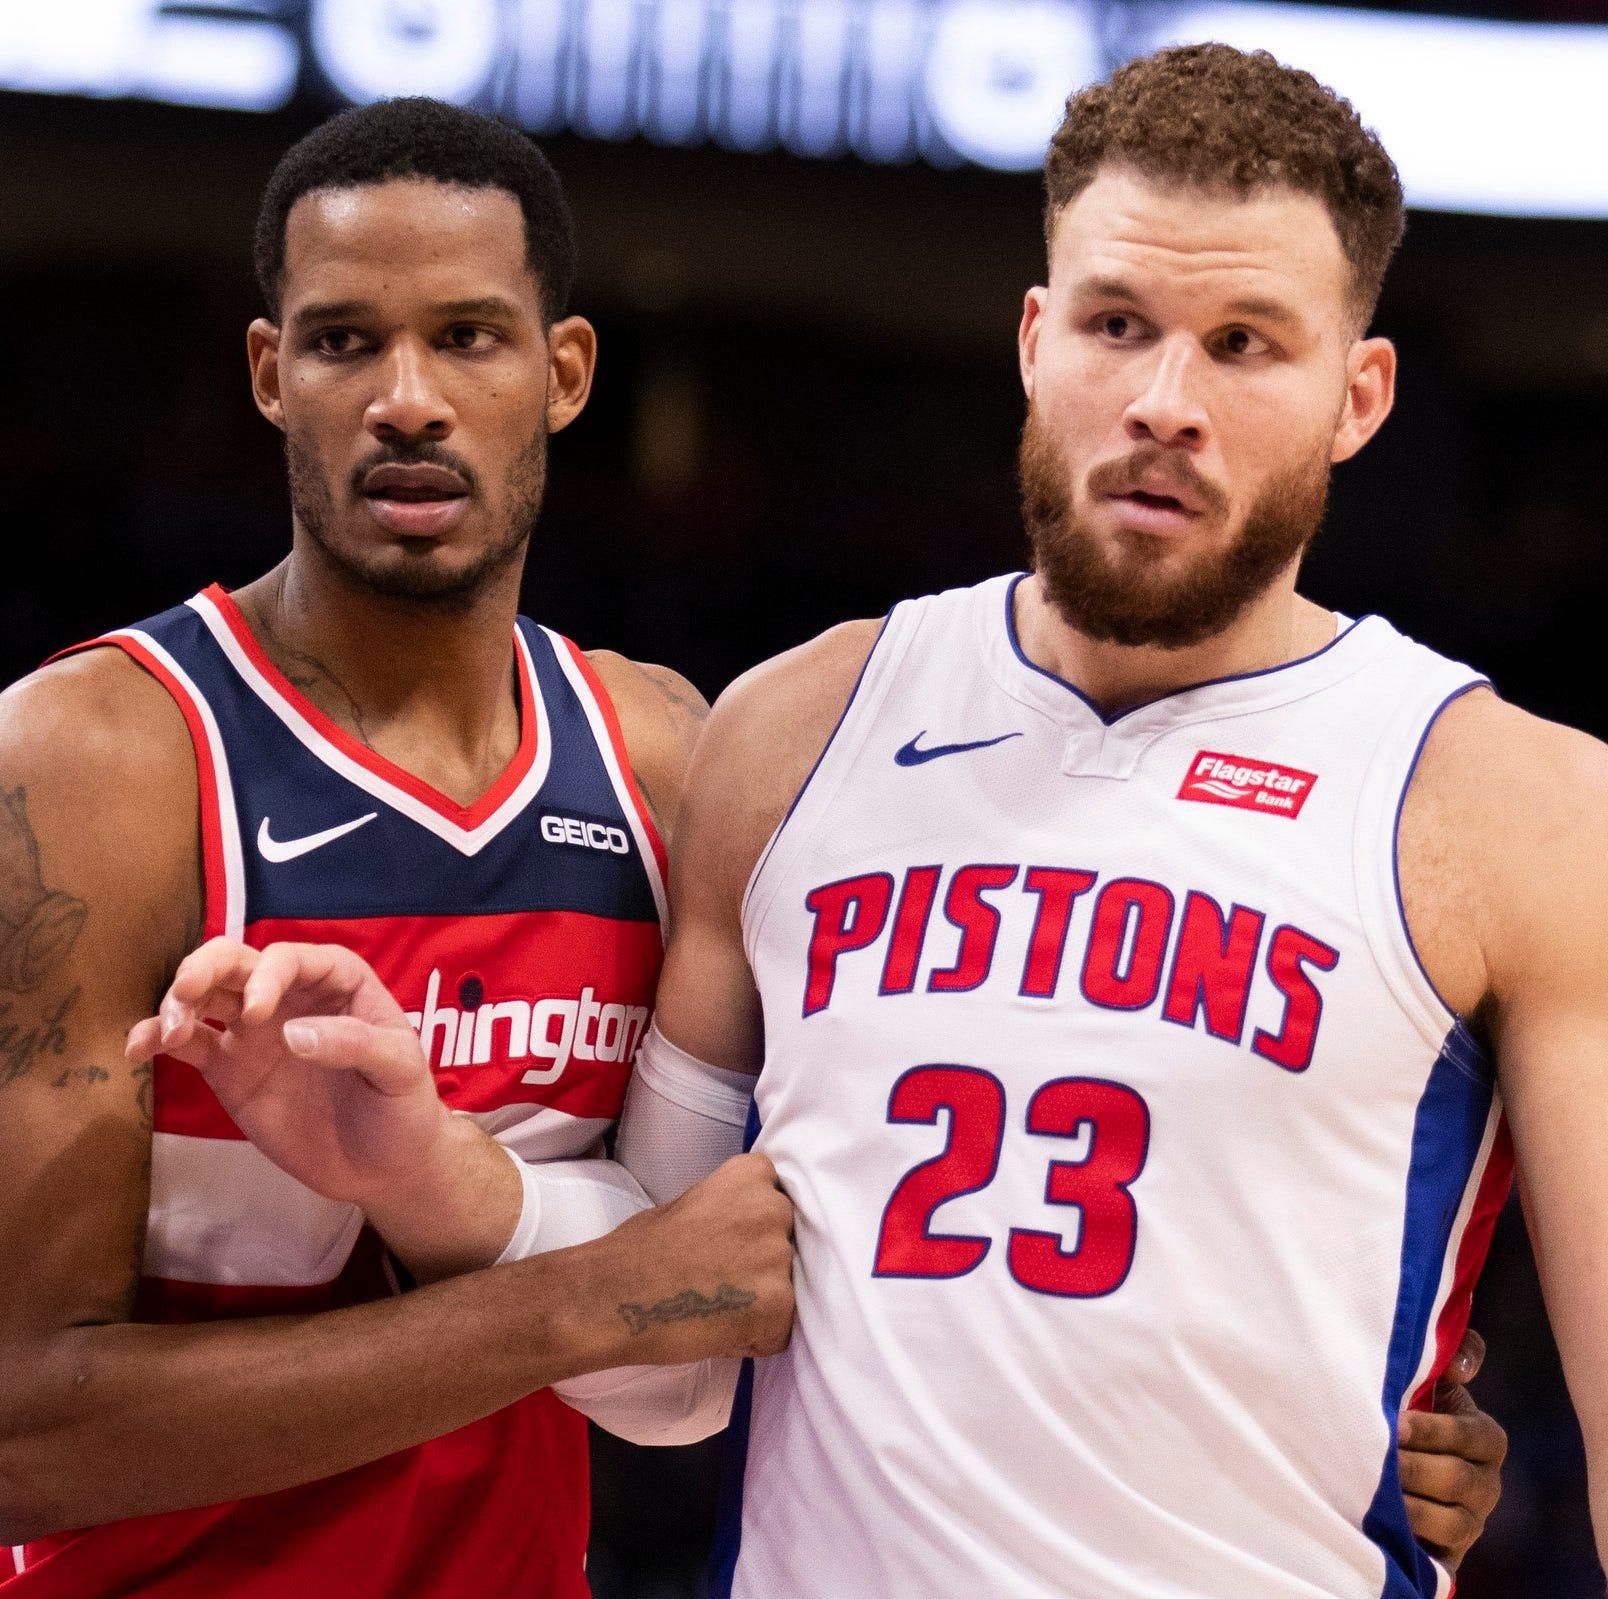 Detroit Pistons visit Washington without Andre Drummond, Ish Smith